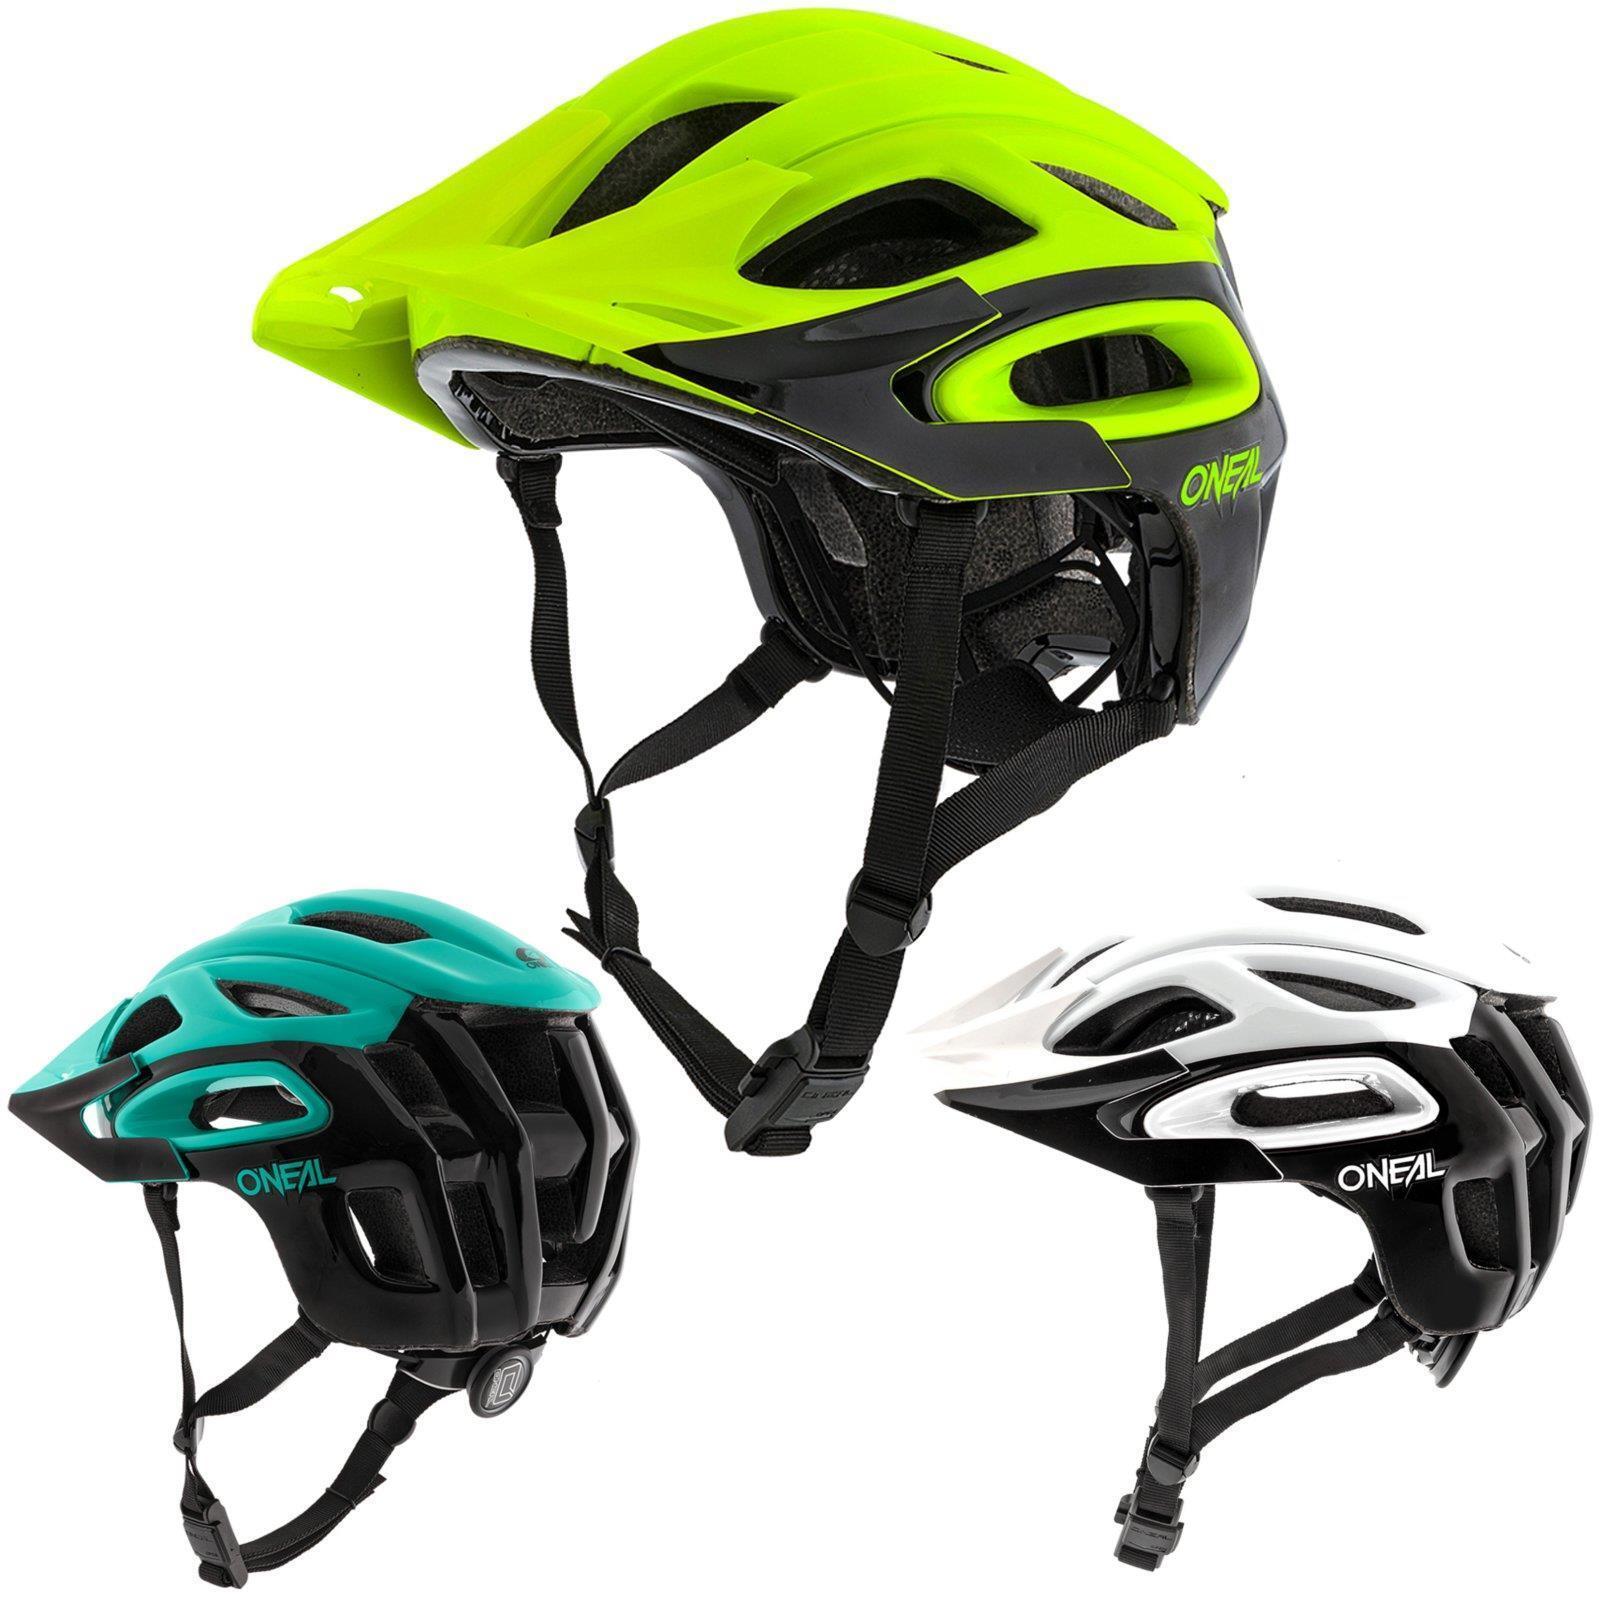 ONeal Orbiter II Solid Fahrrad All Mountain Bike Helm MTB Trekking Enduro Trail